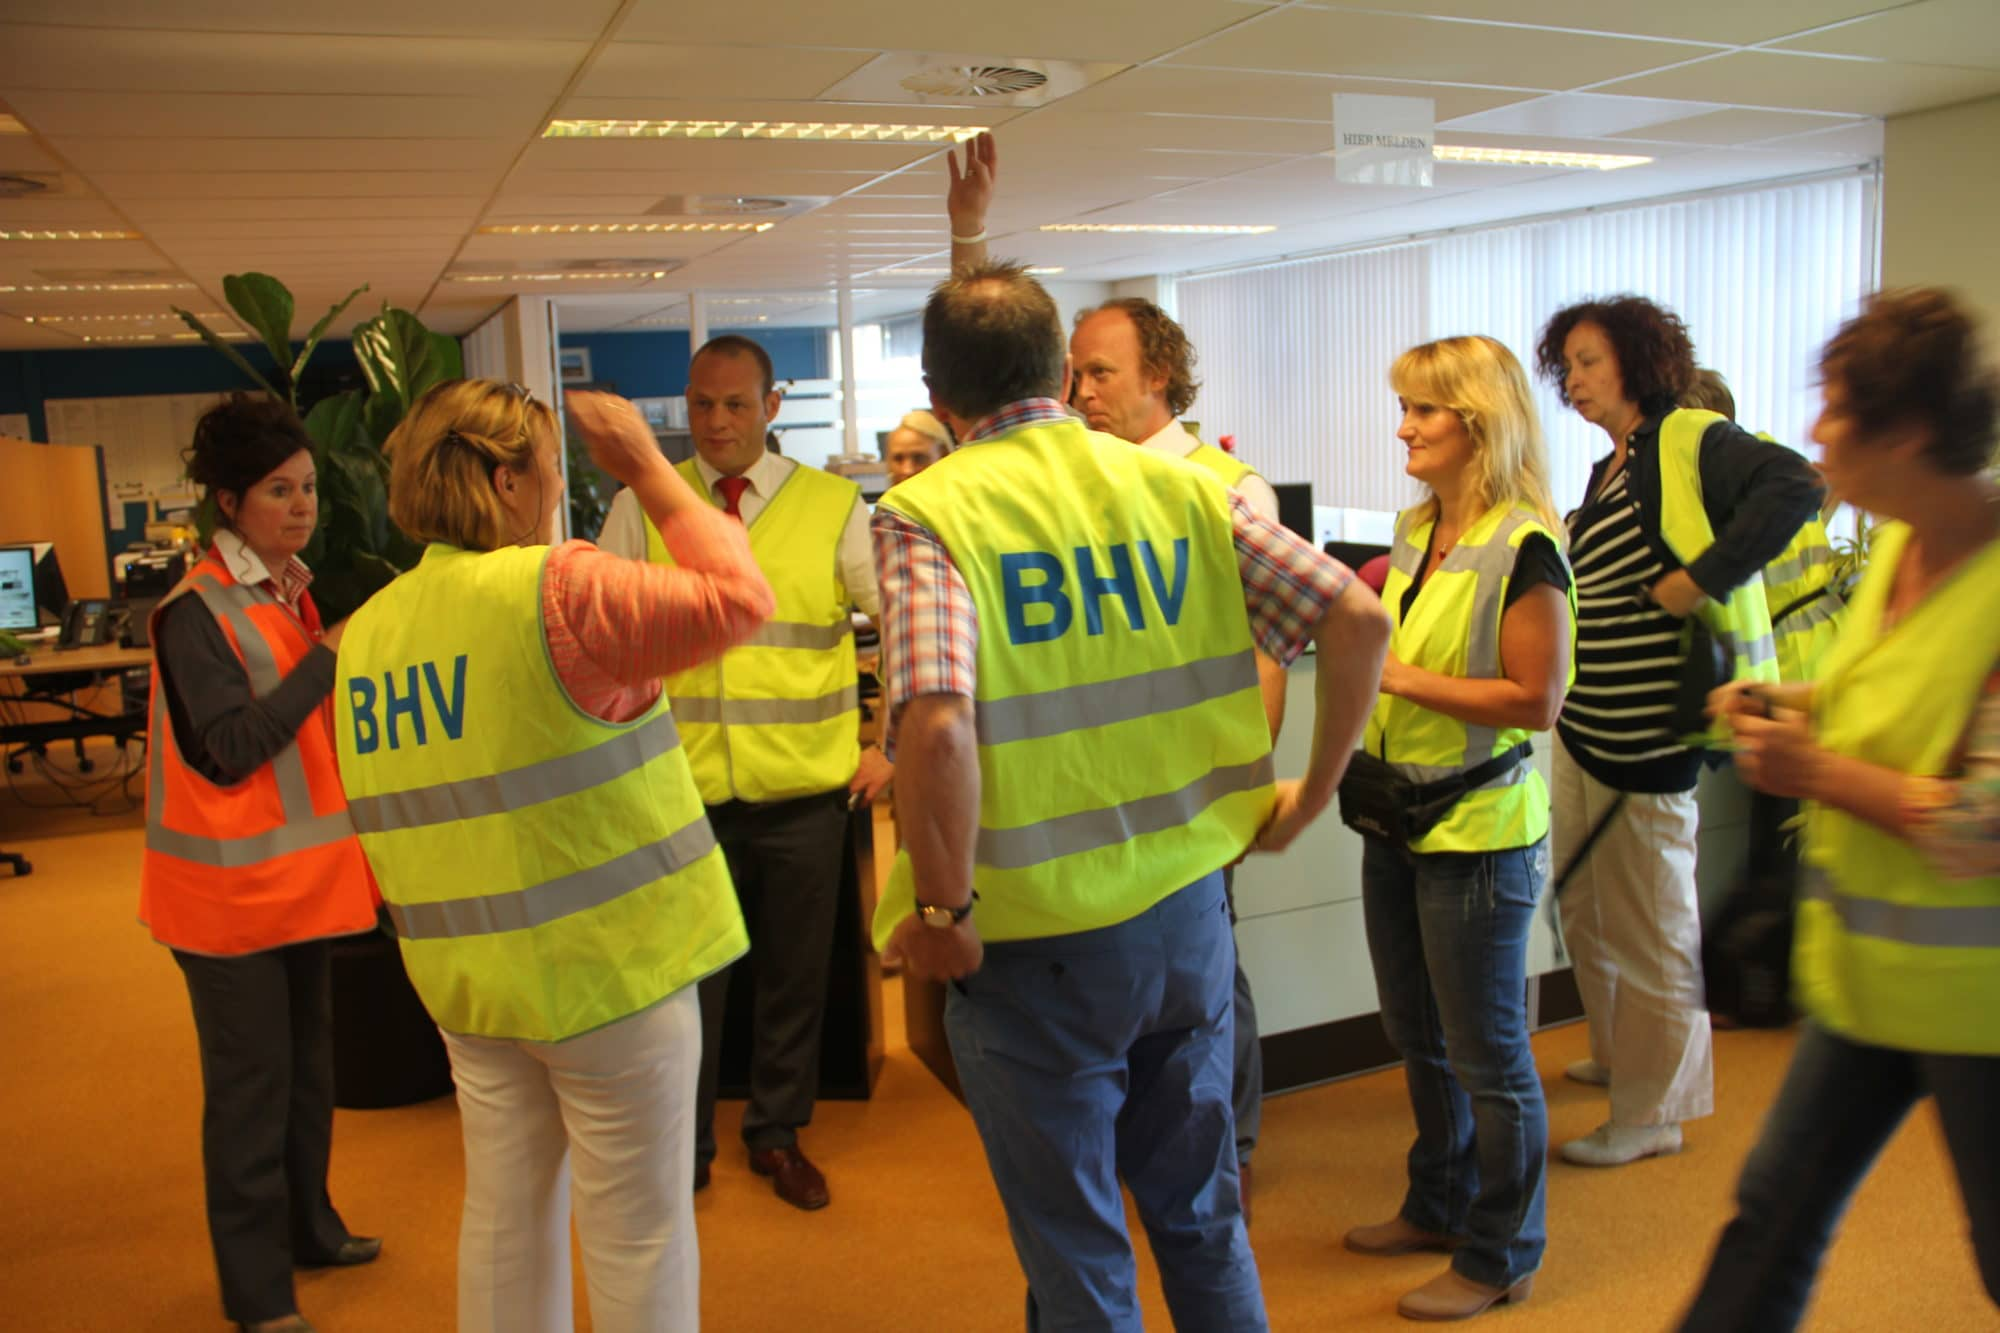 5 November: Dag van de BHV